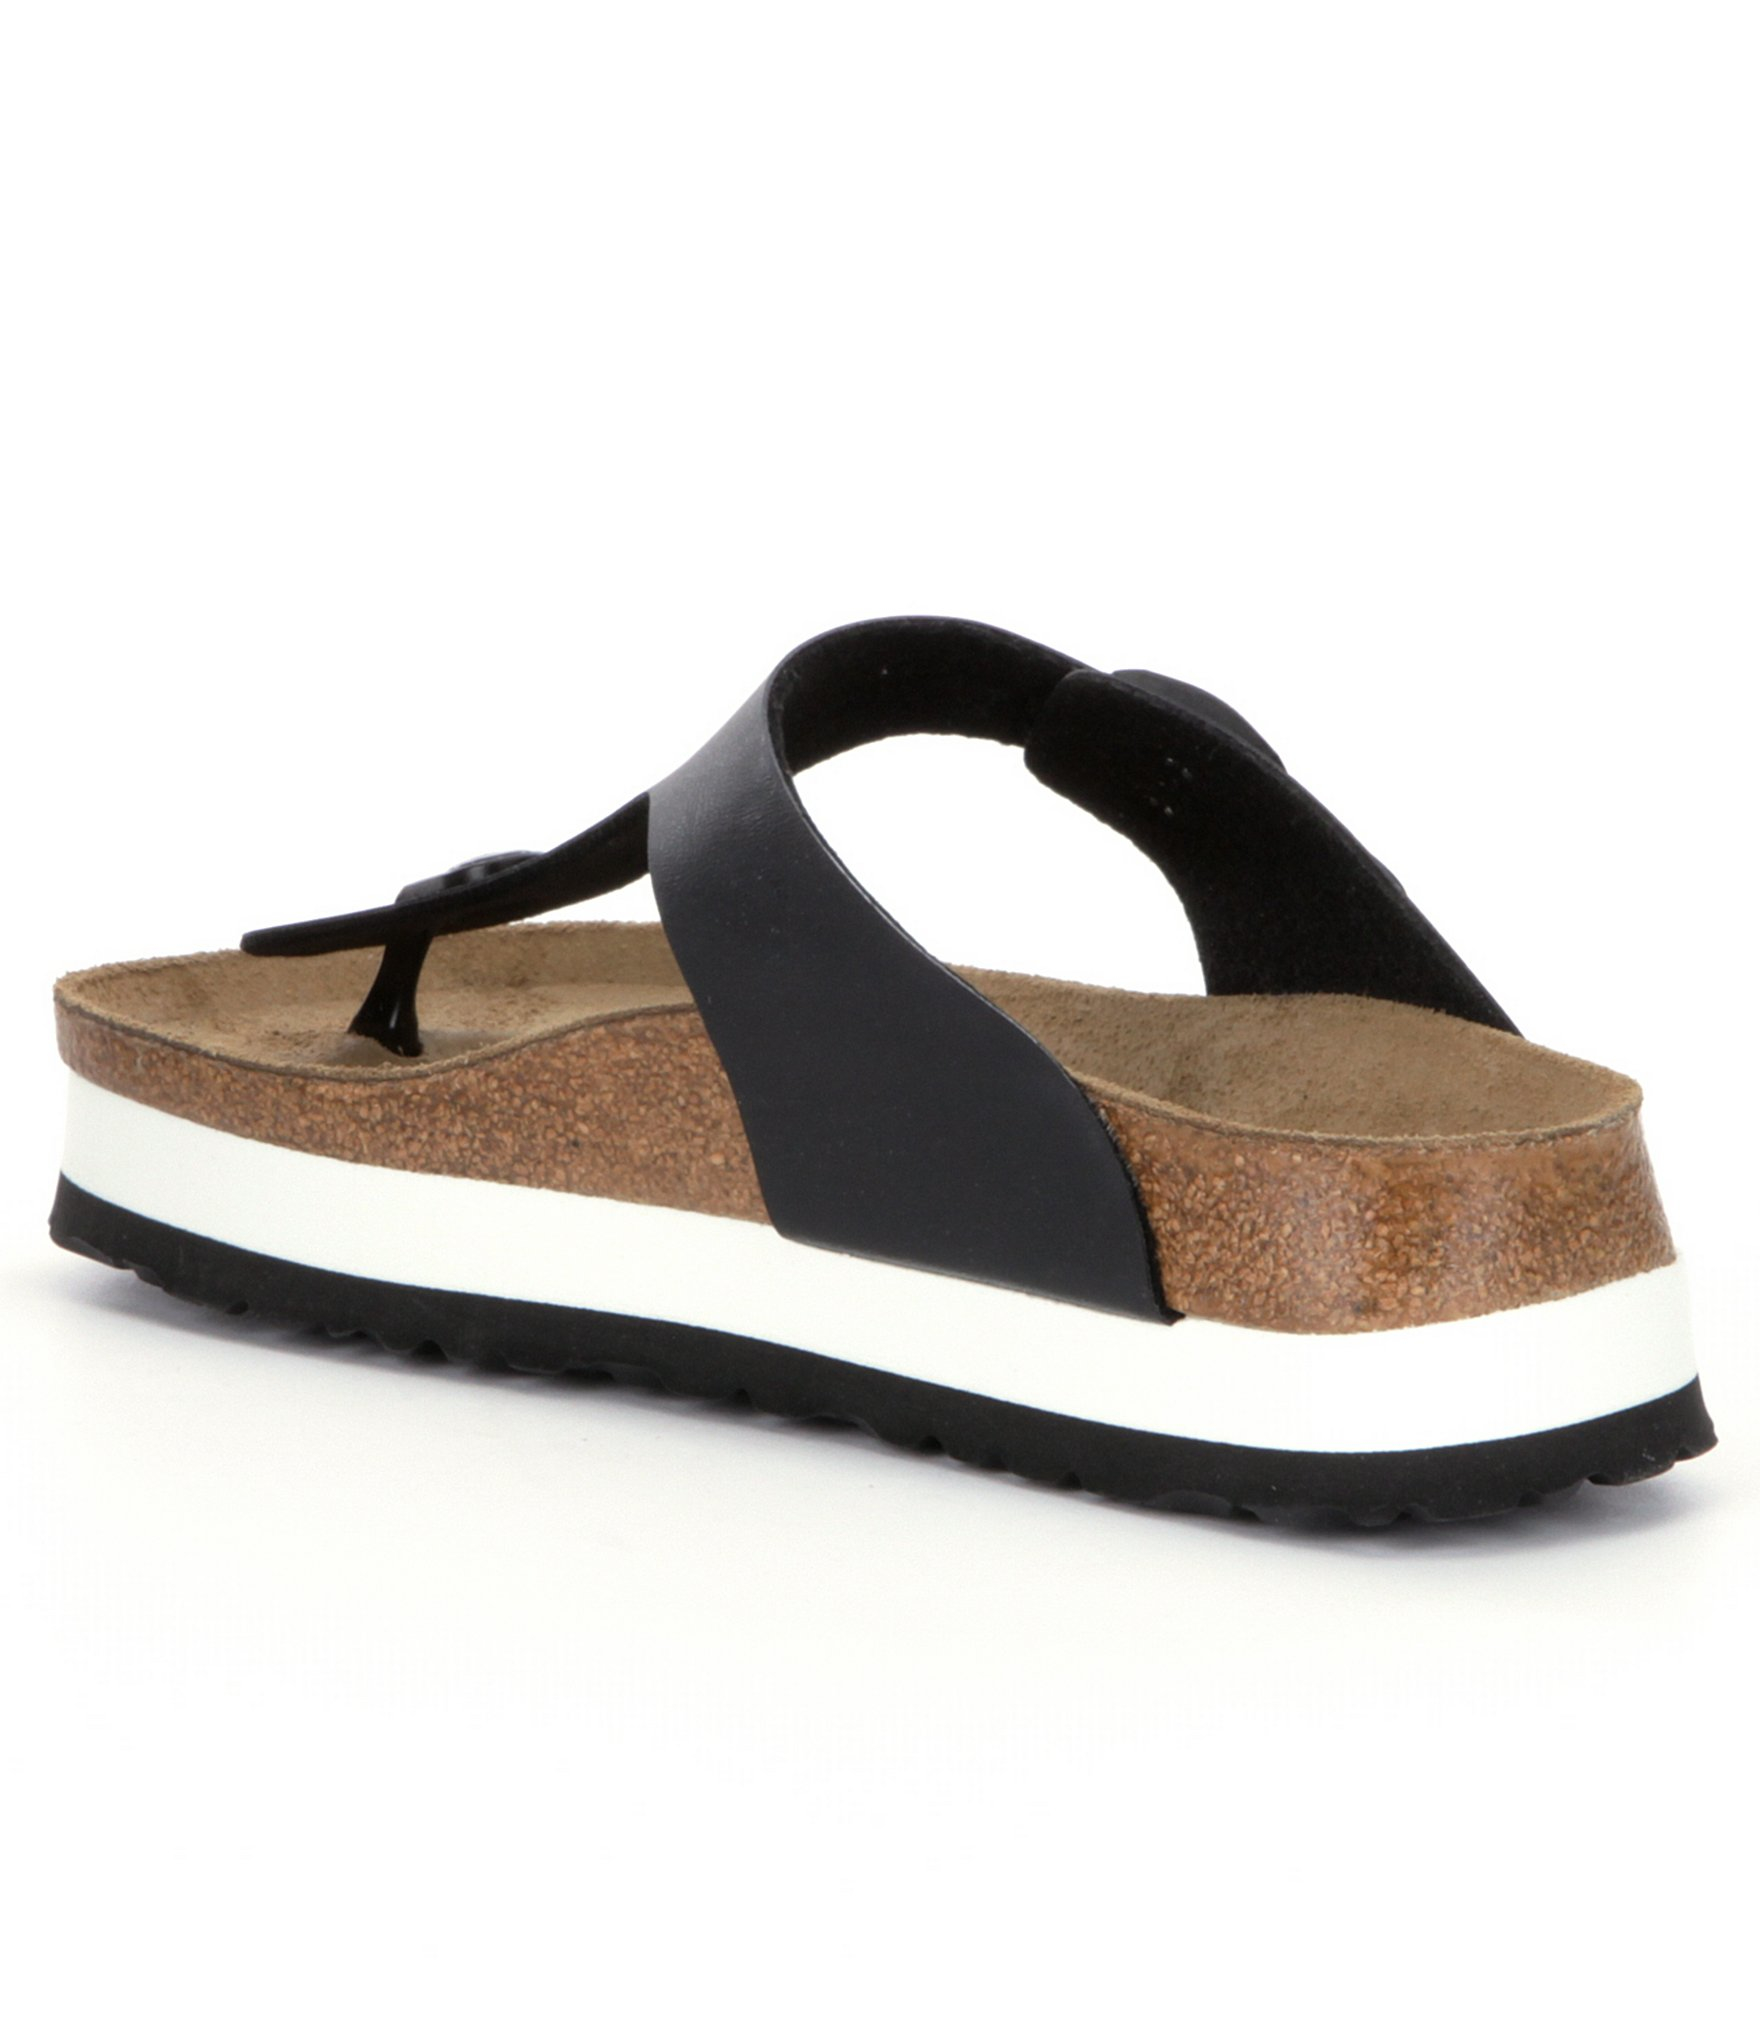 Birkenstock Gizeh Women S Platform Sandals In Black Lyst